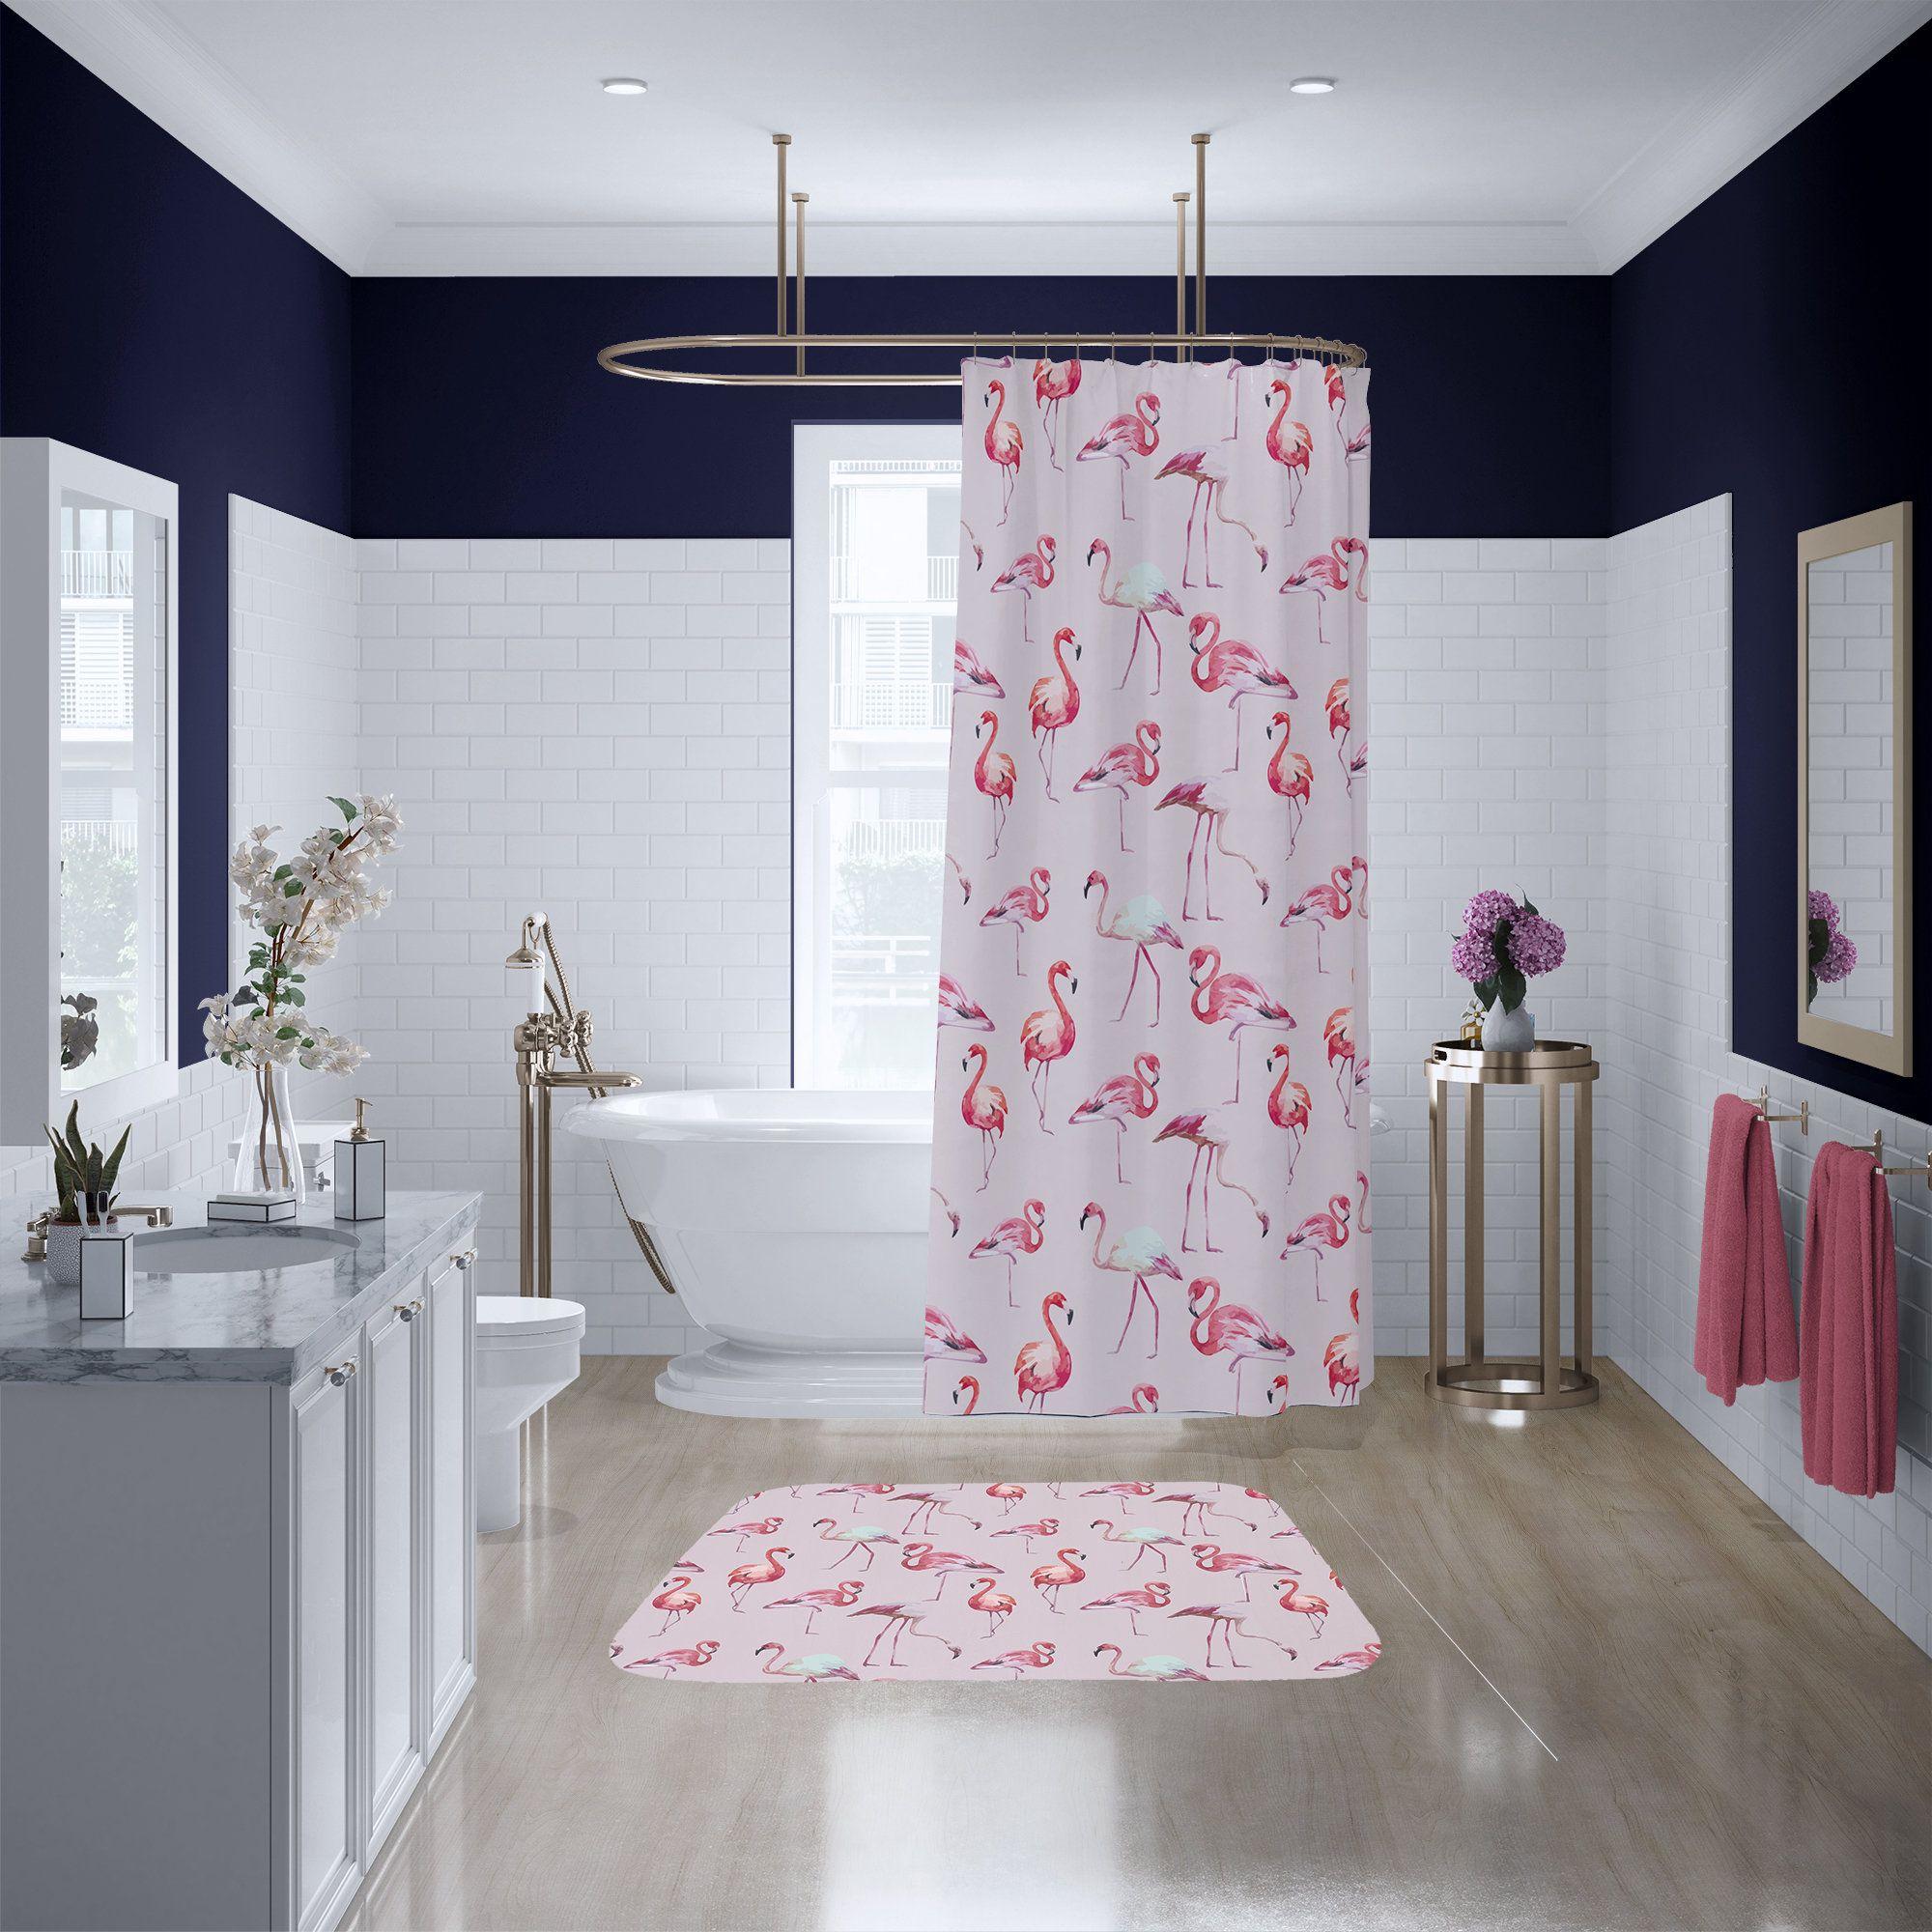 Pink Flamingo Pattern Shower Curtain Custom Printed Bath Curtain Fabric Shower Curtain Extra Long Bath Curtain Fabric Shower Curtains Pink Shower Curtains Long Shower Curtains